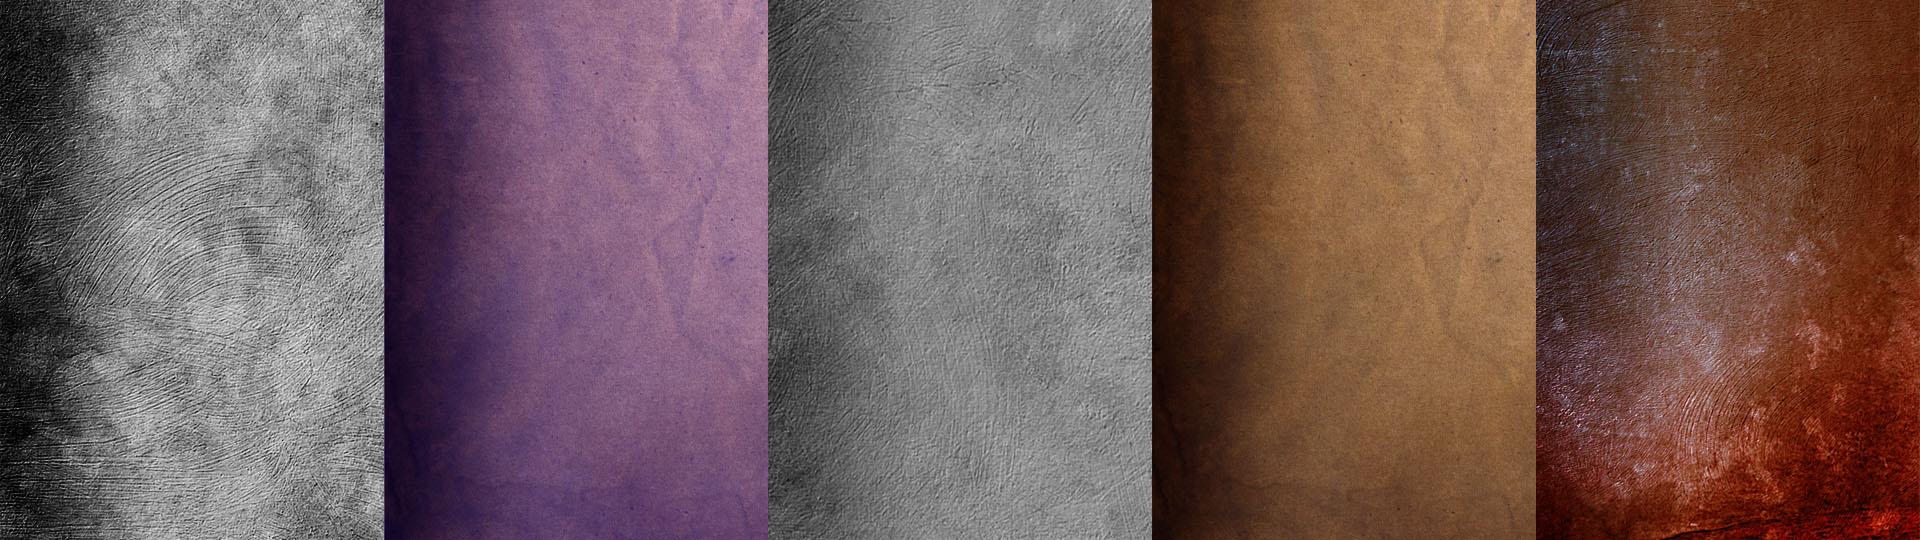 texture samples smaller